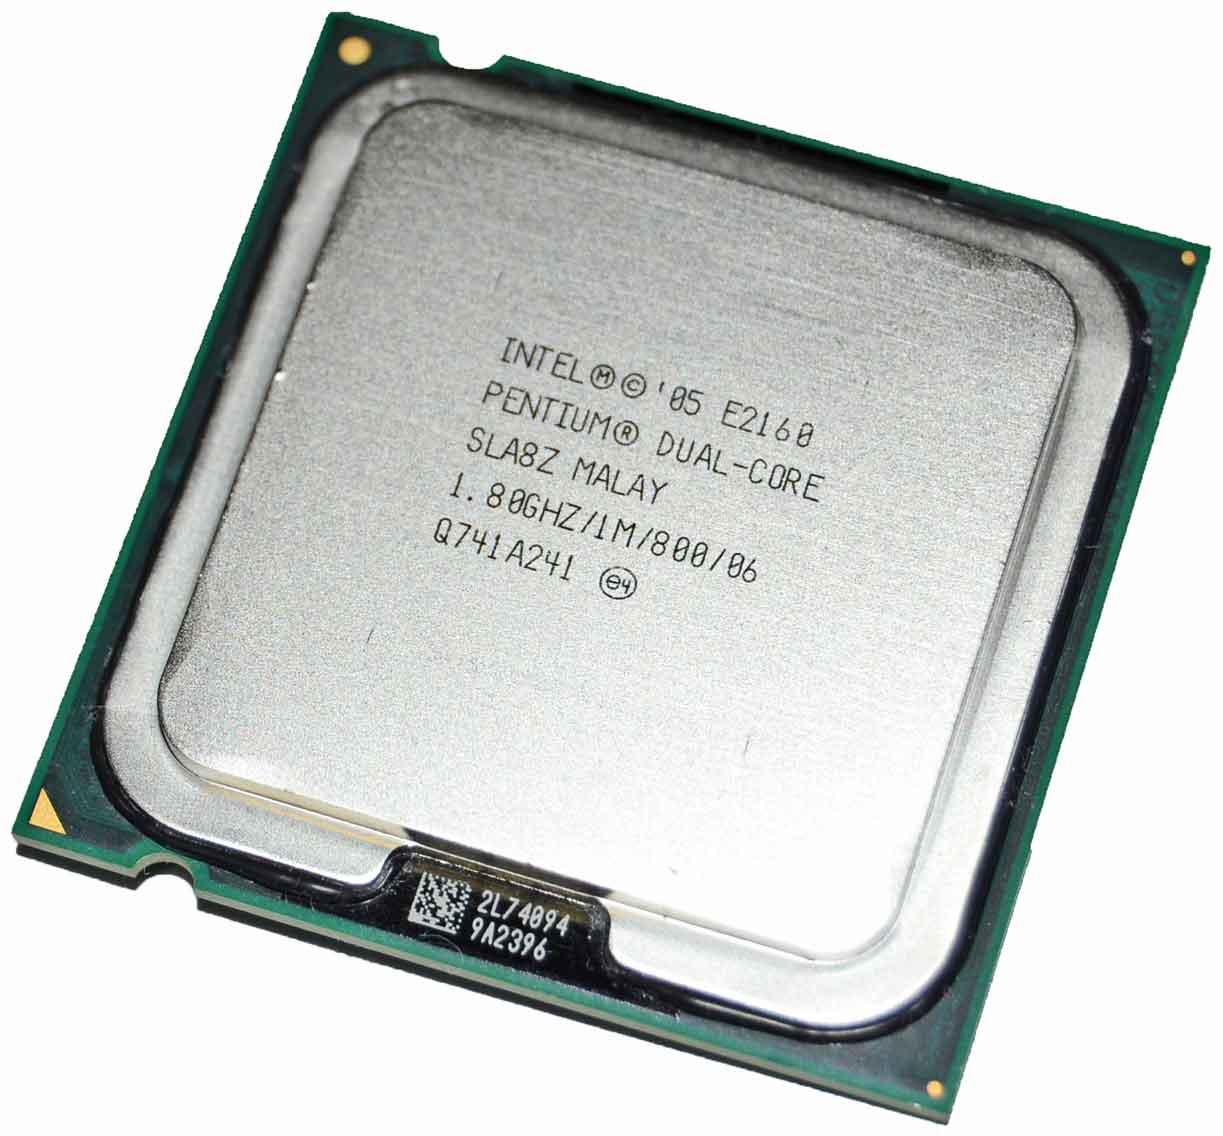 Intel Pentium Dual Core CPU Processor 1.80 E2160 SLA8Z